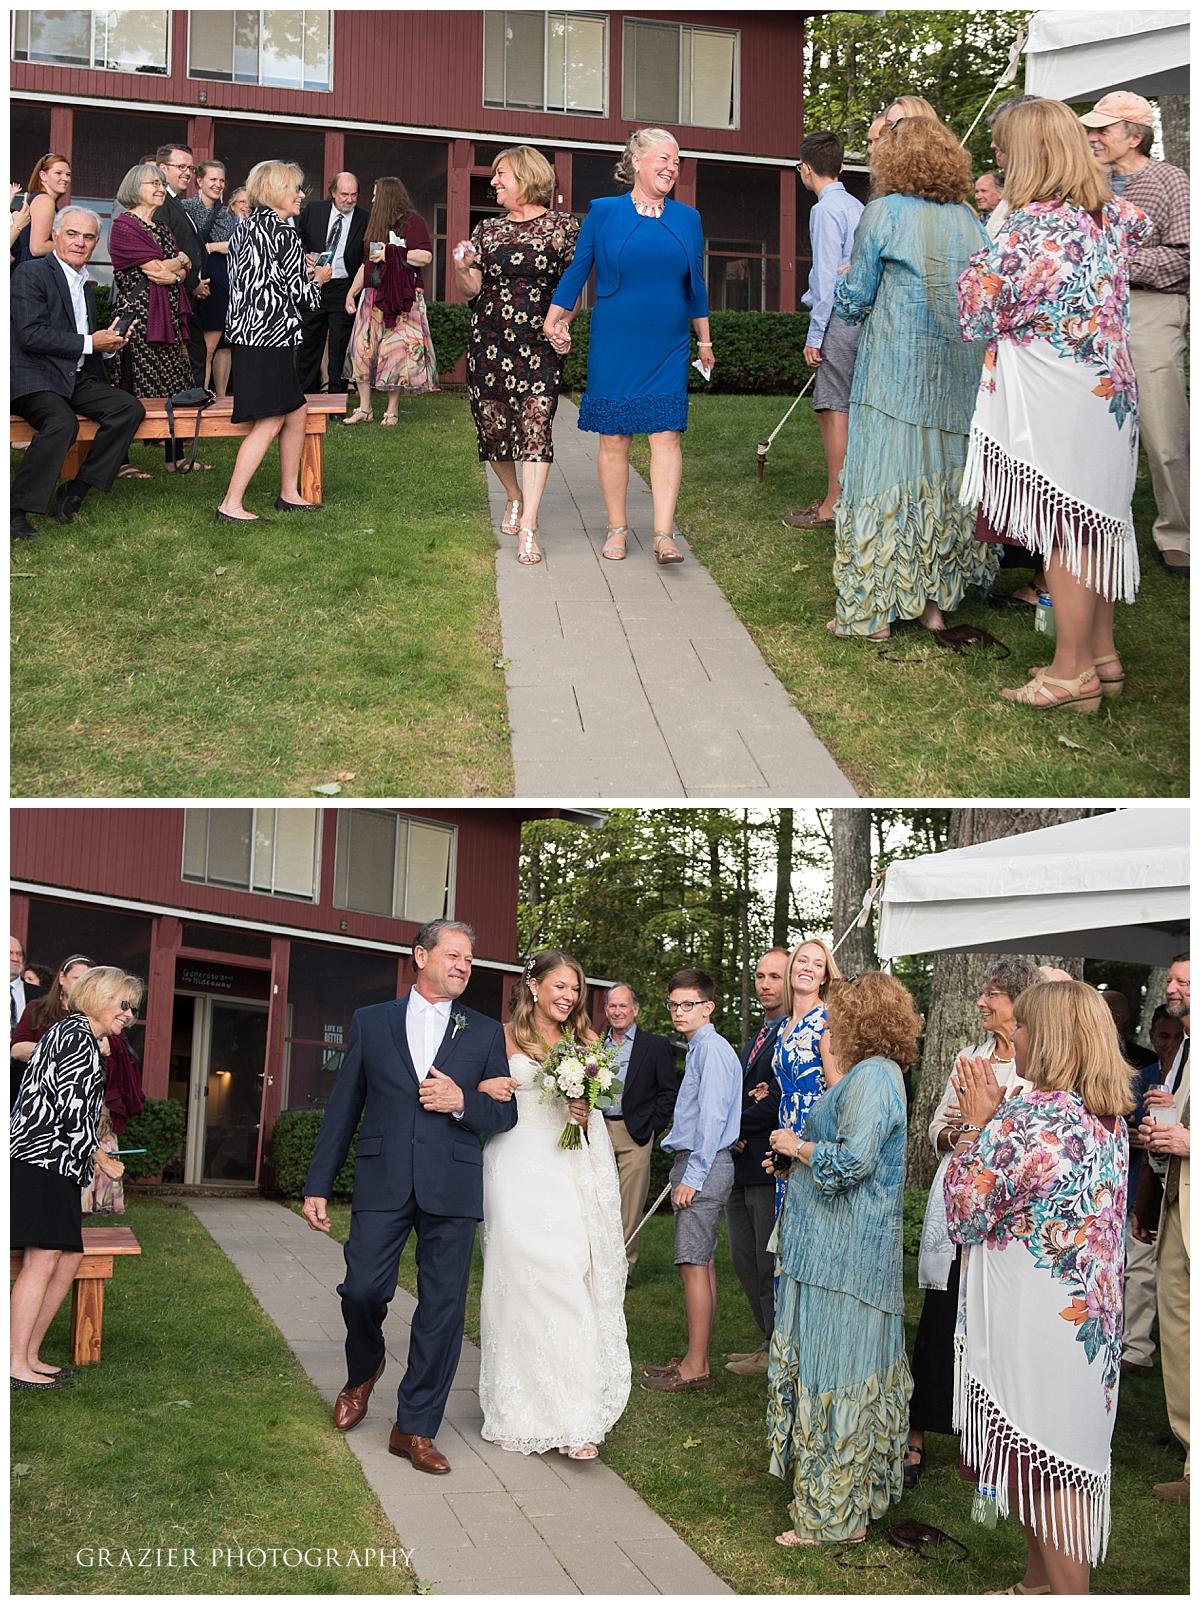 New Hampshire Lake Wedding Grazier Photography 170909-157_WEB.jpg